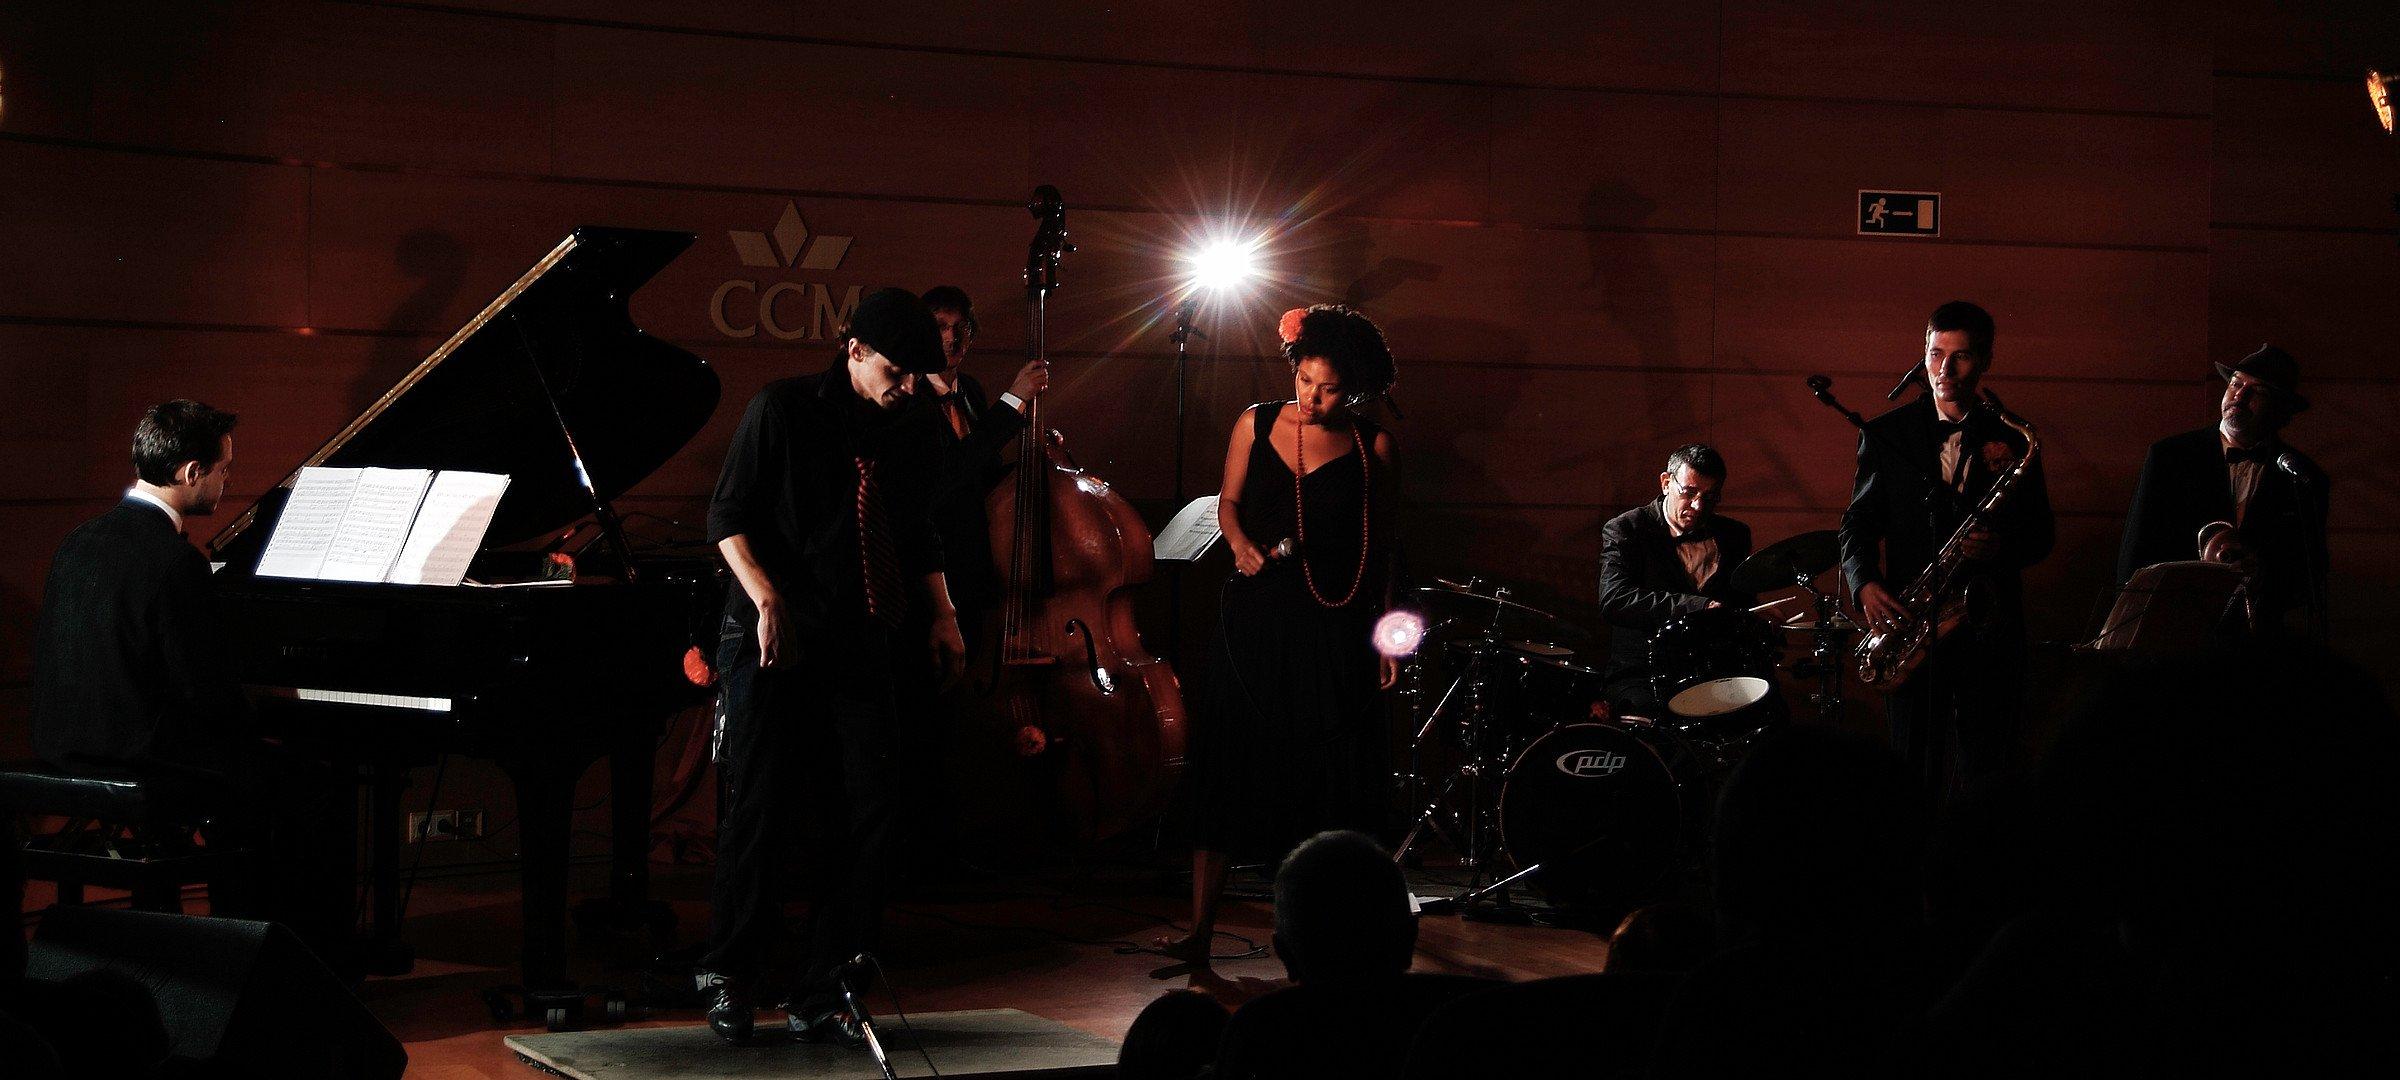 T J Jazz en el Cultural Caja de Burgos